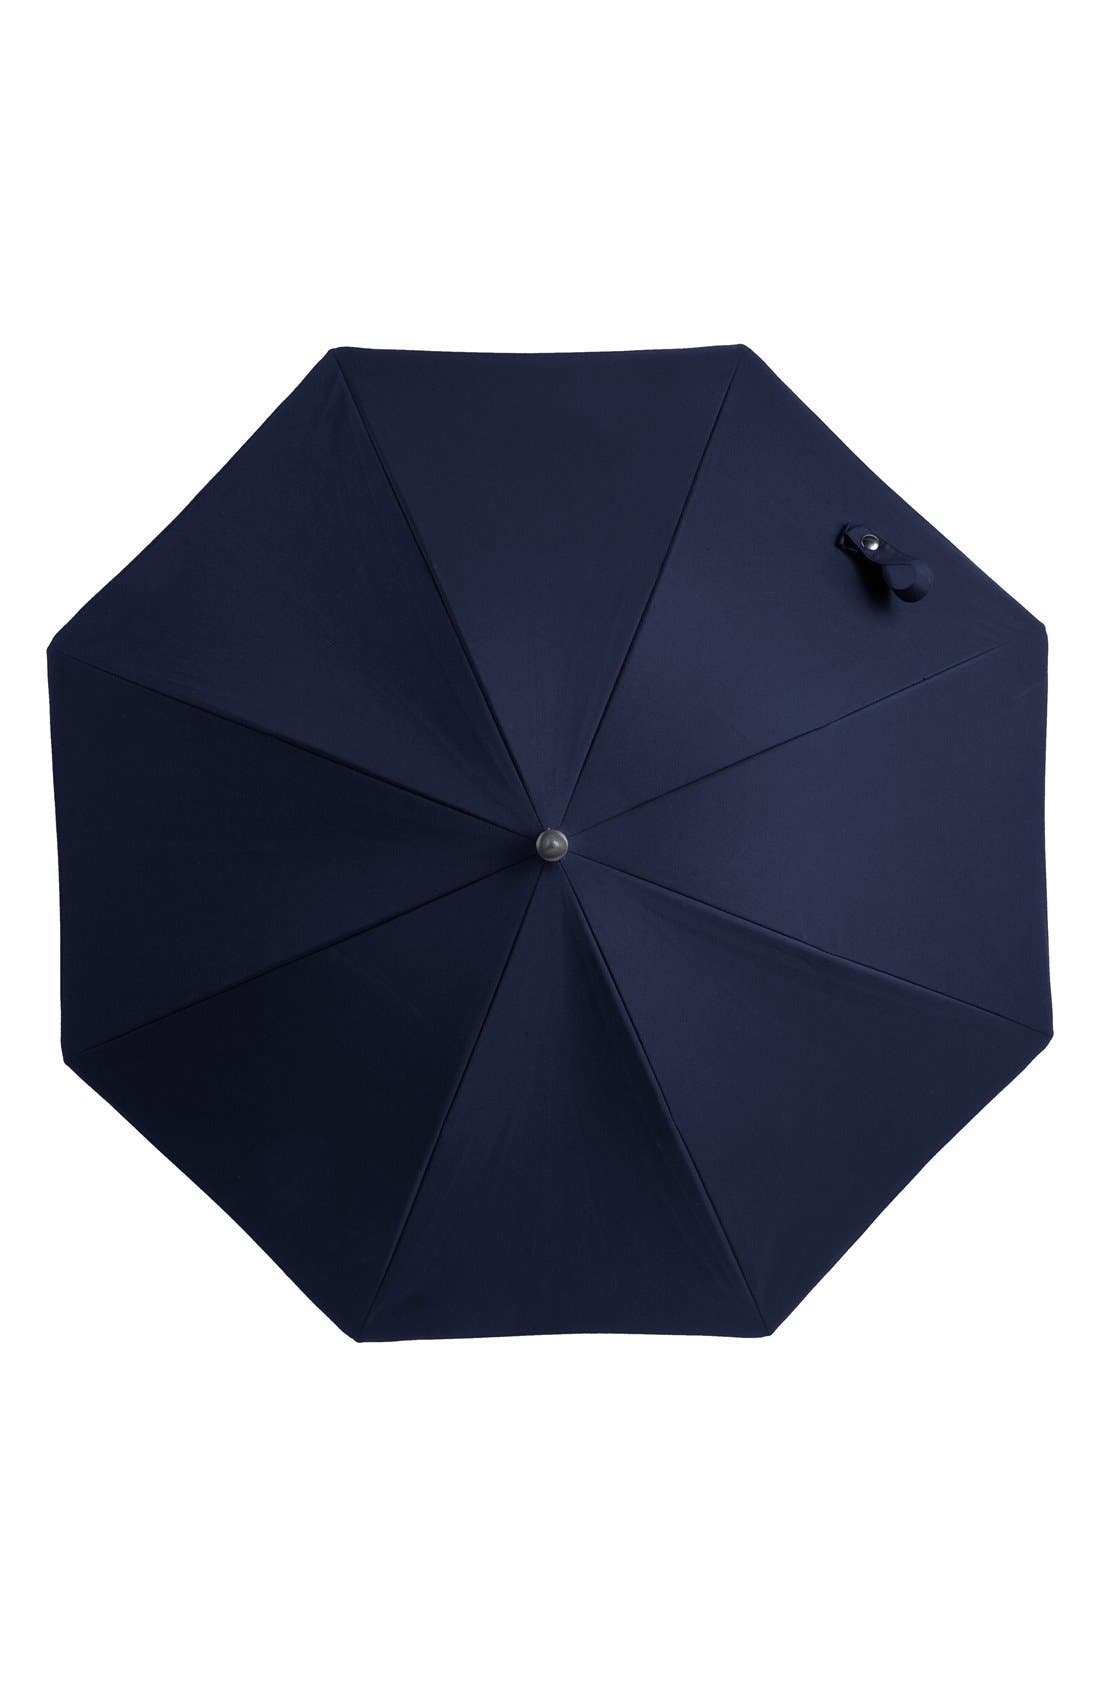 Stroller Parasol,                         Main,                         color, 400